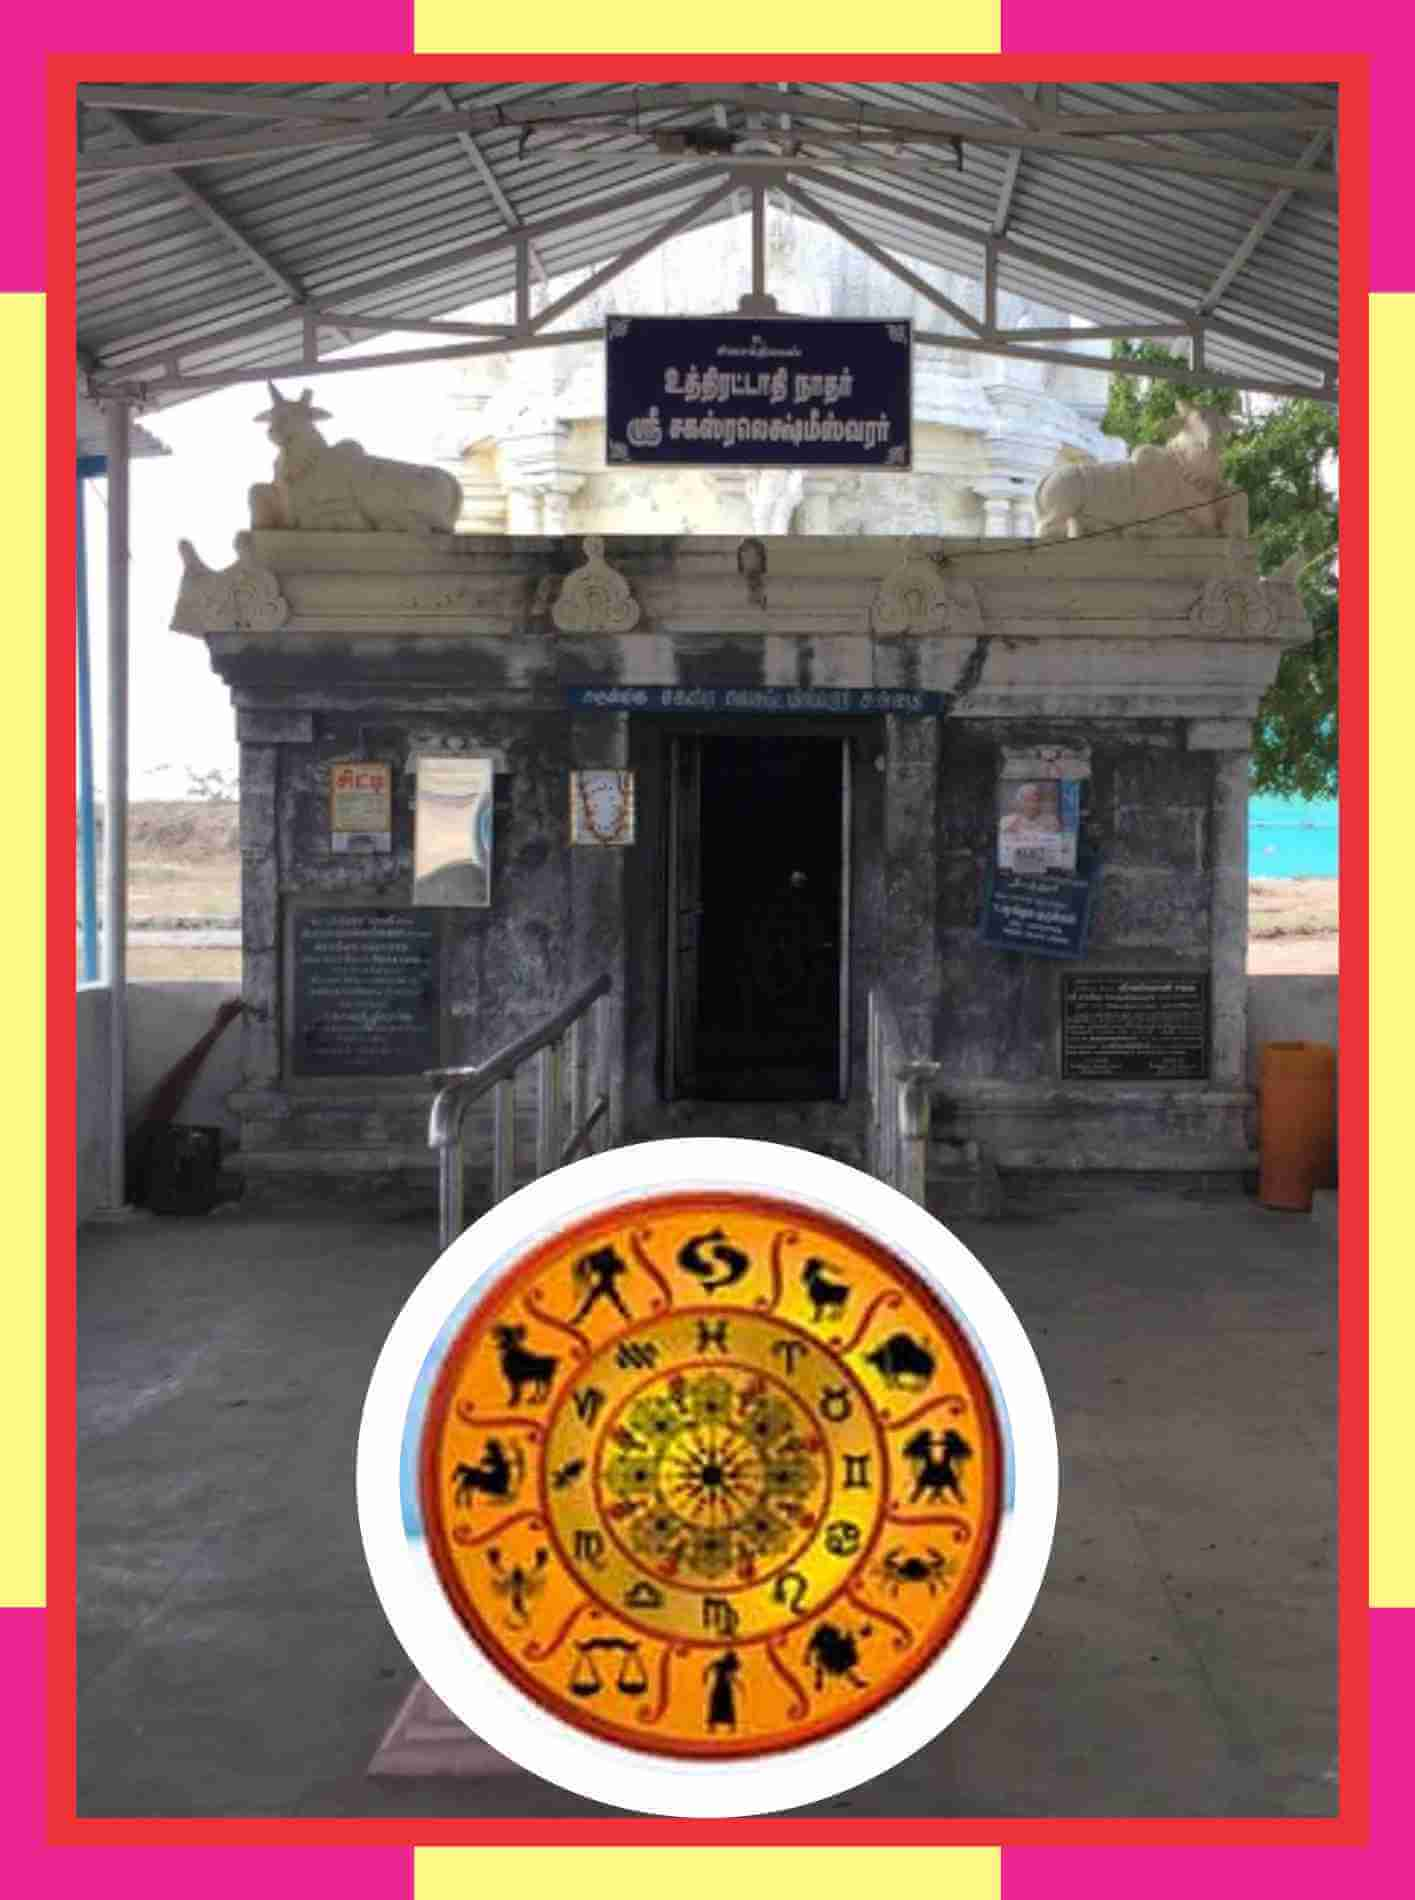 Theeyathur – Sahasra Lakshmeeswarar Temple Spl Parihara Puja for Uthirattathi Star